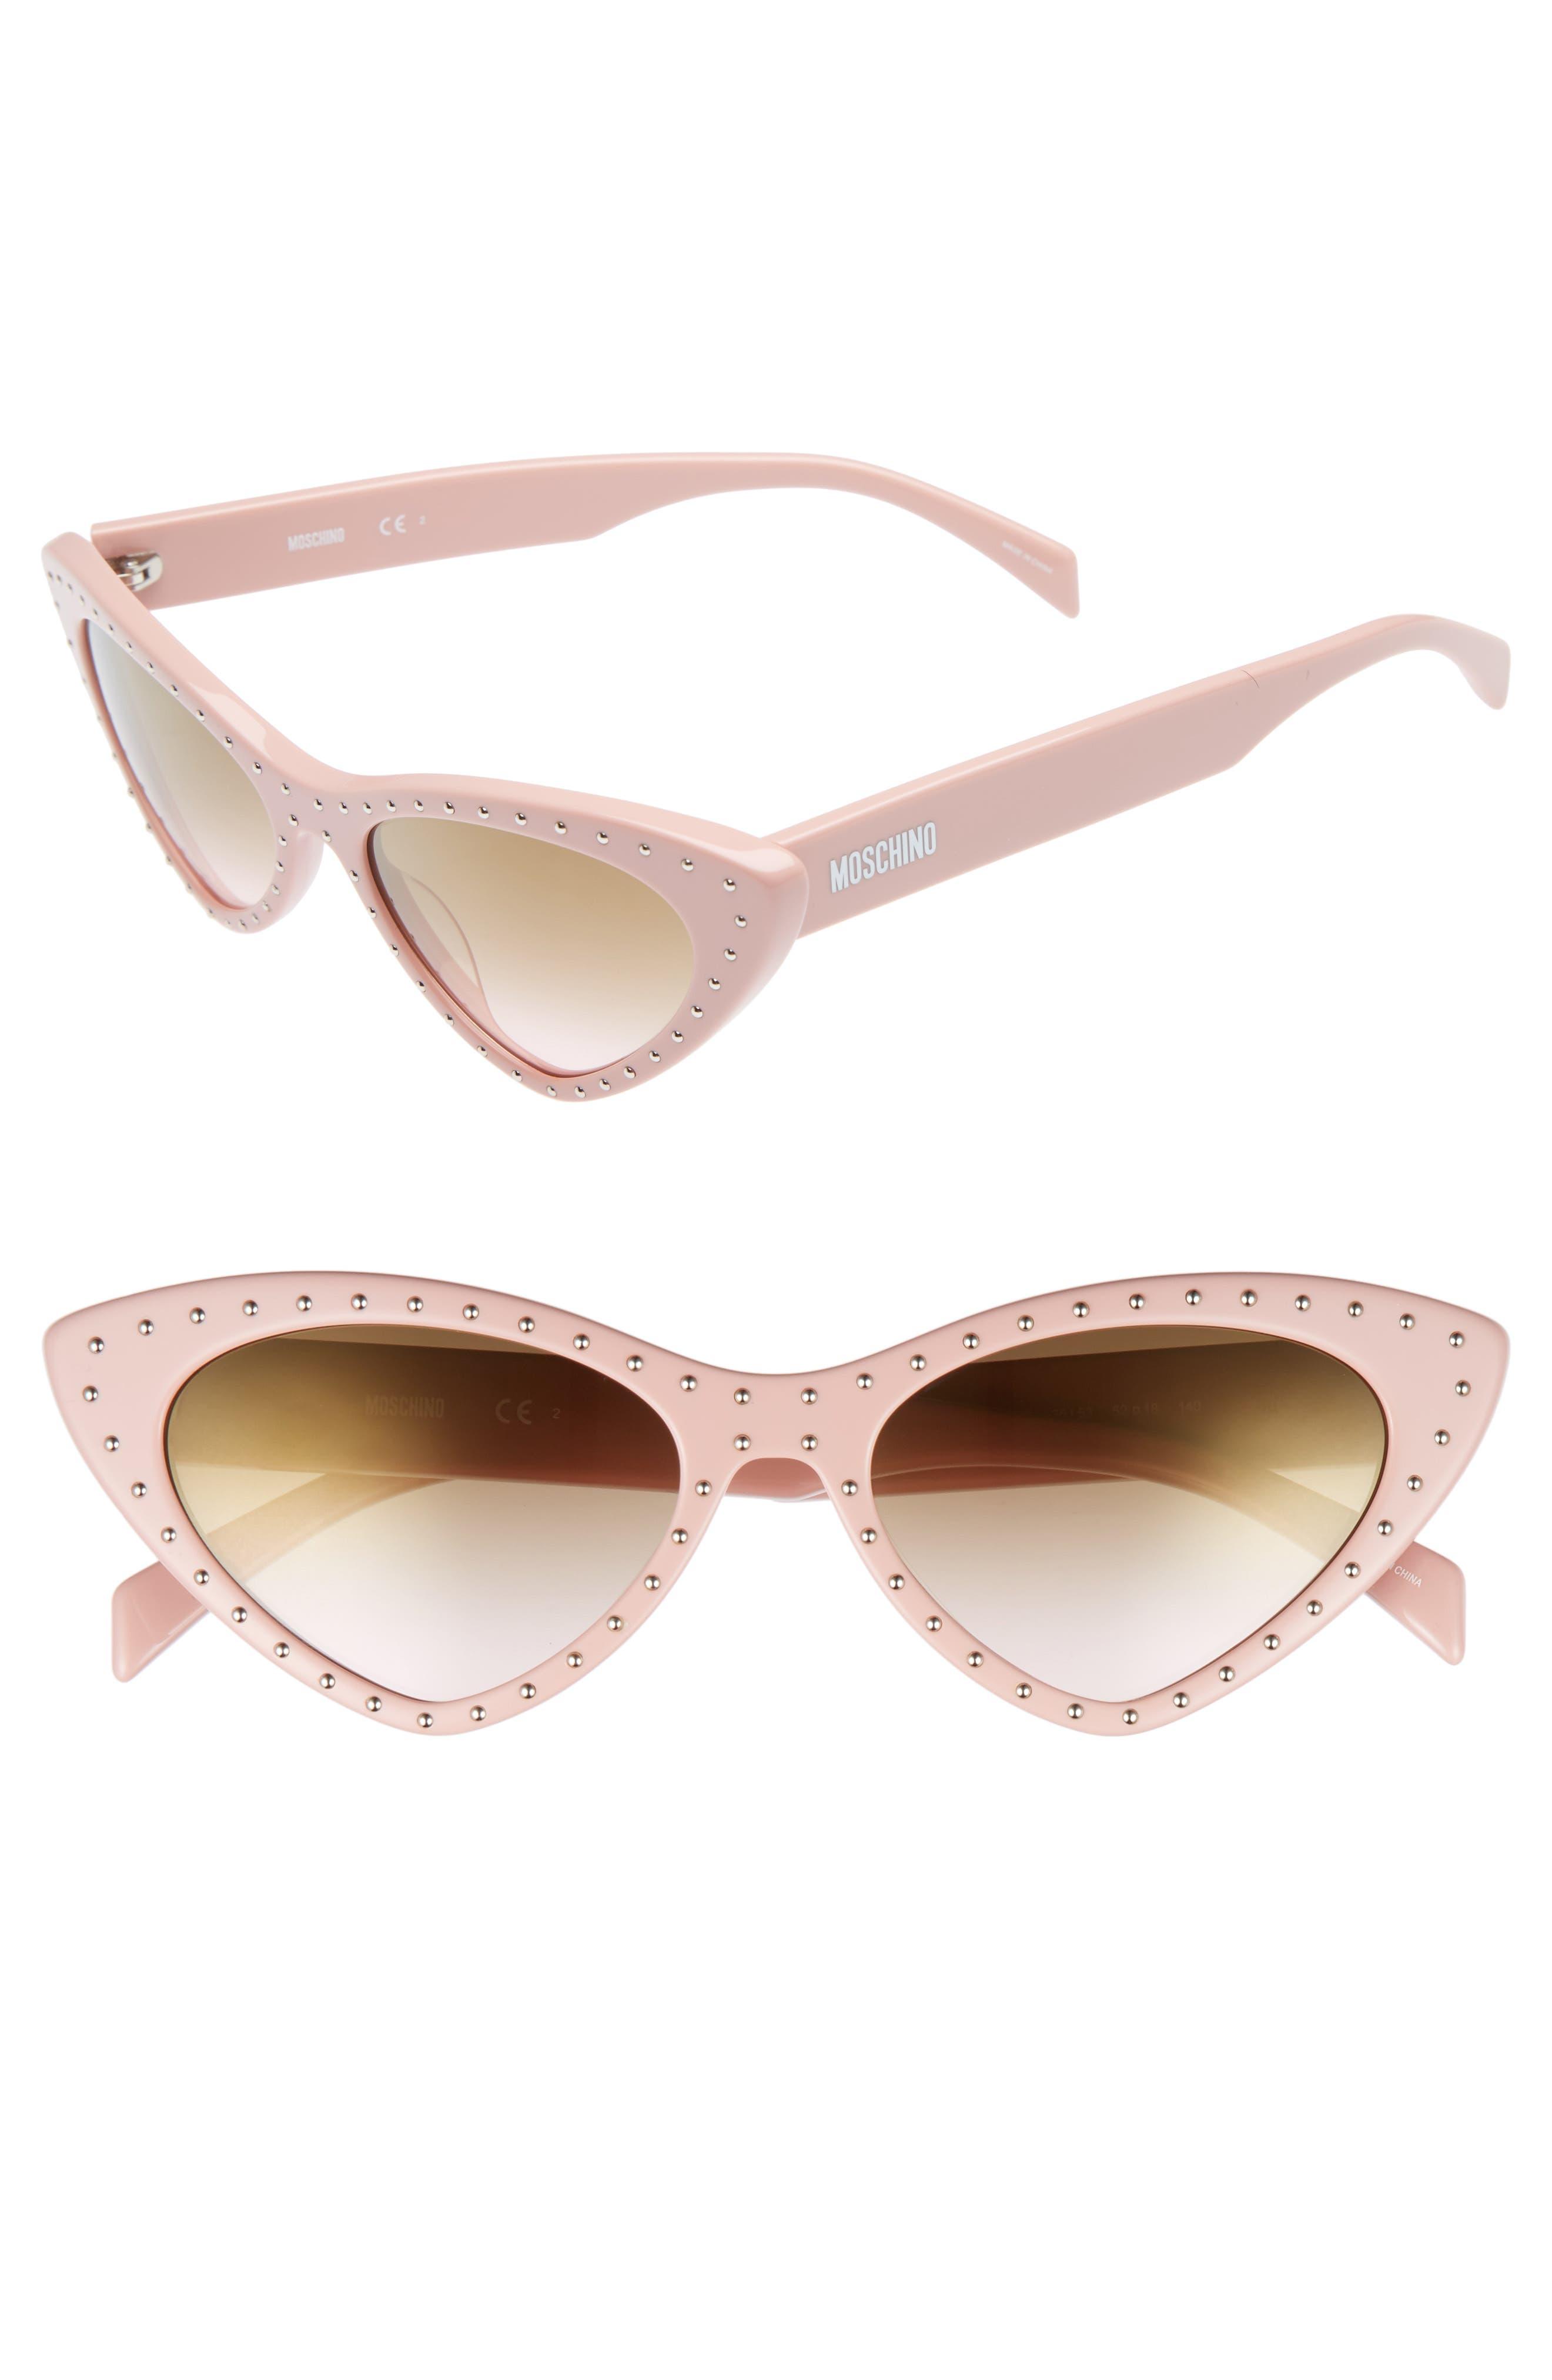 52mm Cat's Eye Sunglasses,                         Main,                         color, PINK